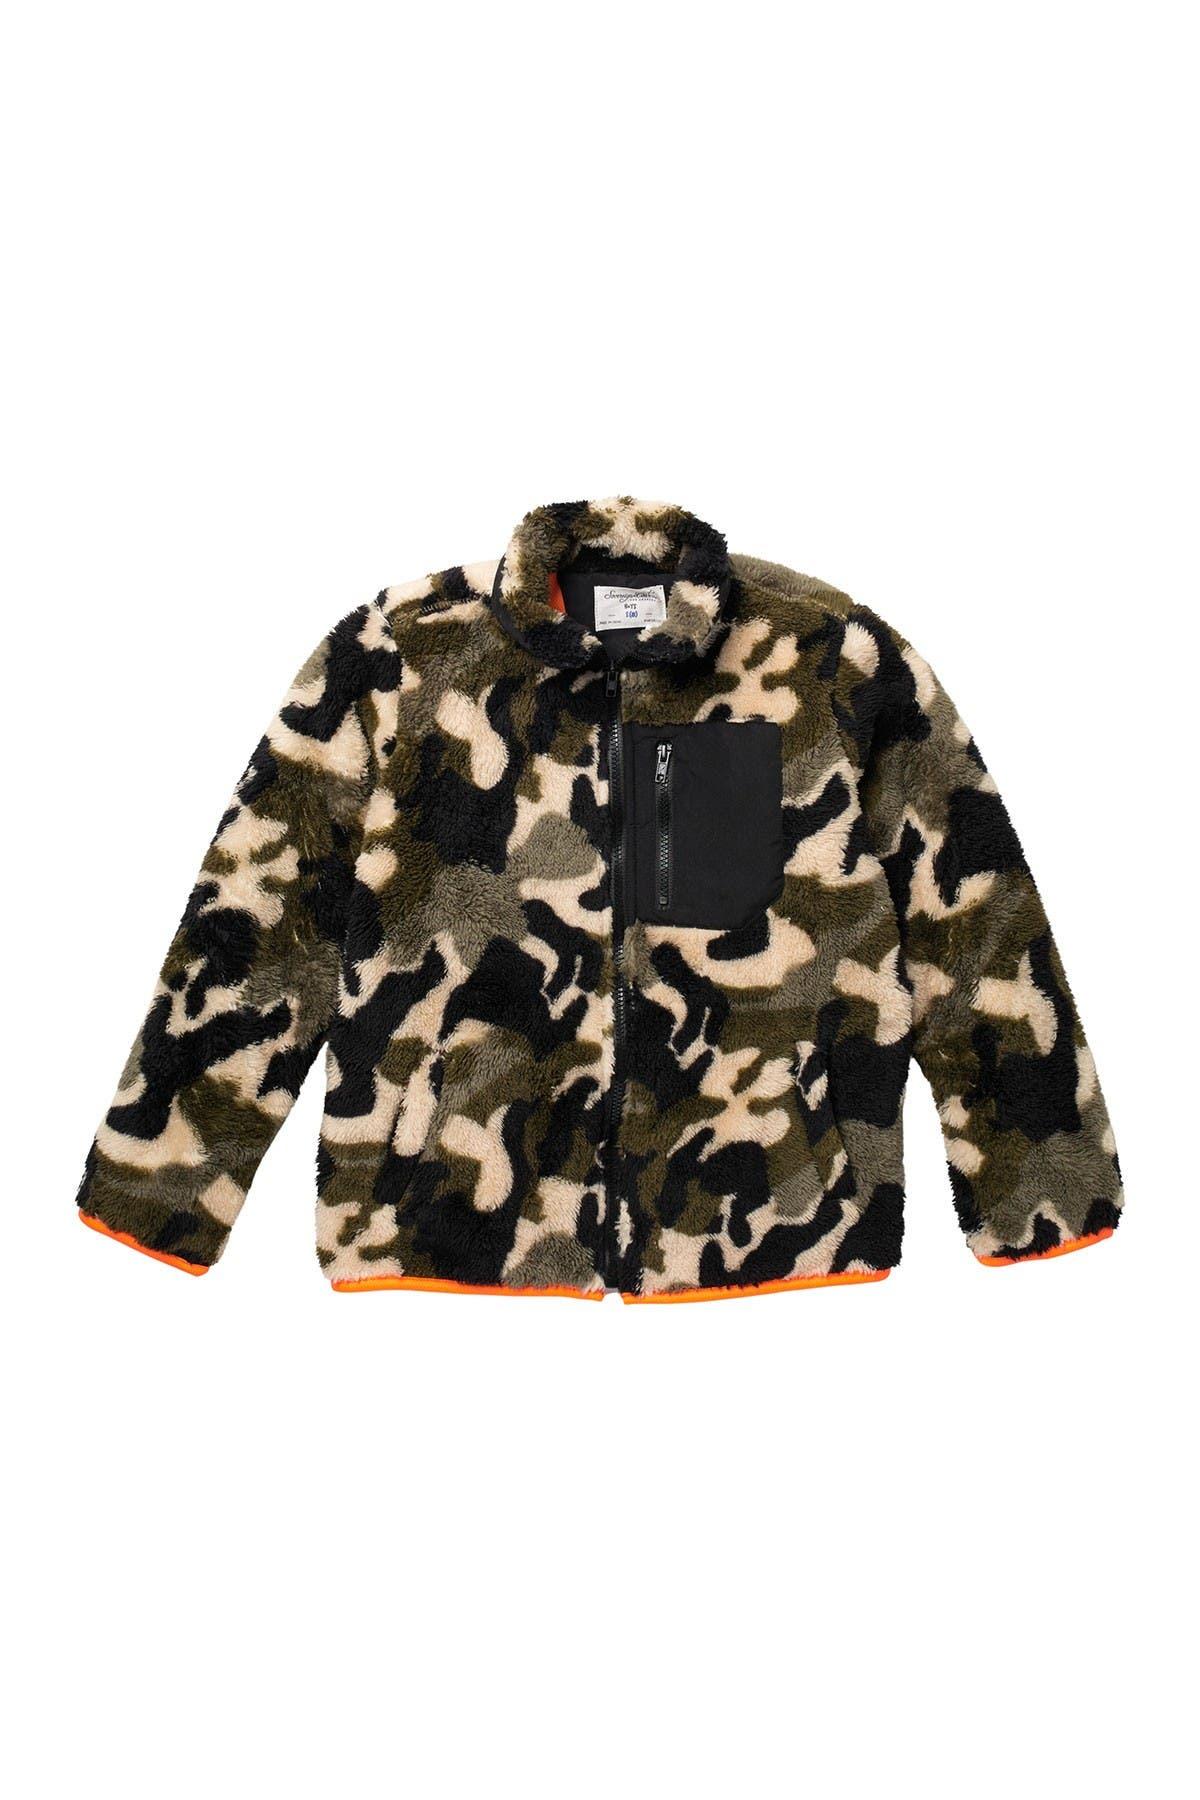 Image of Sovereign Code Himmel Camo Print Fleece Jacket